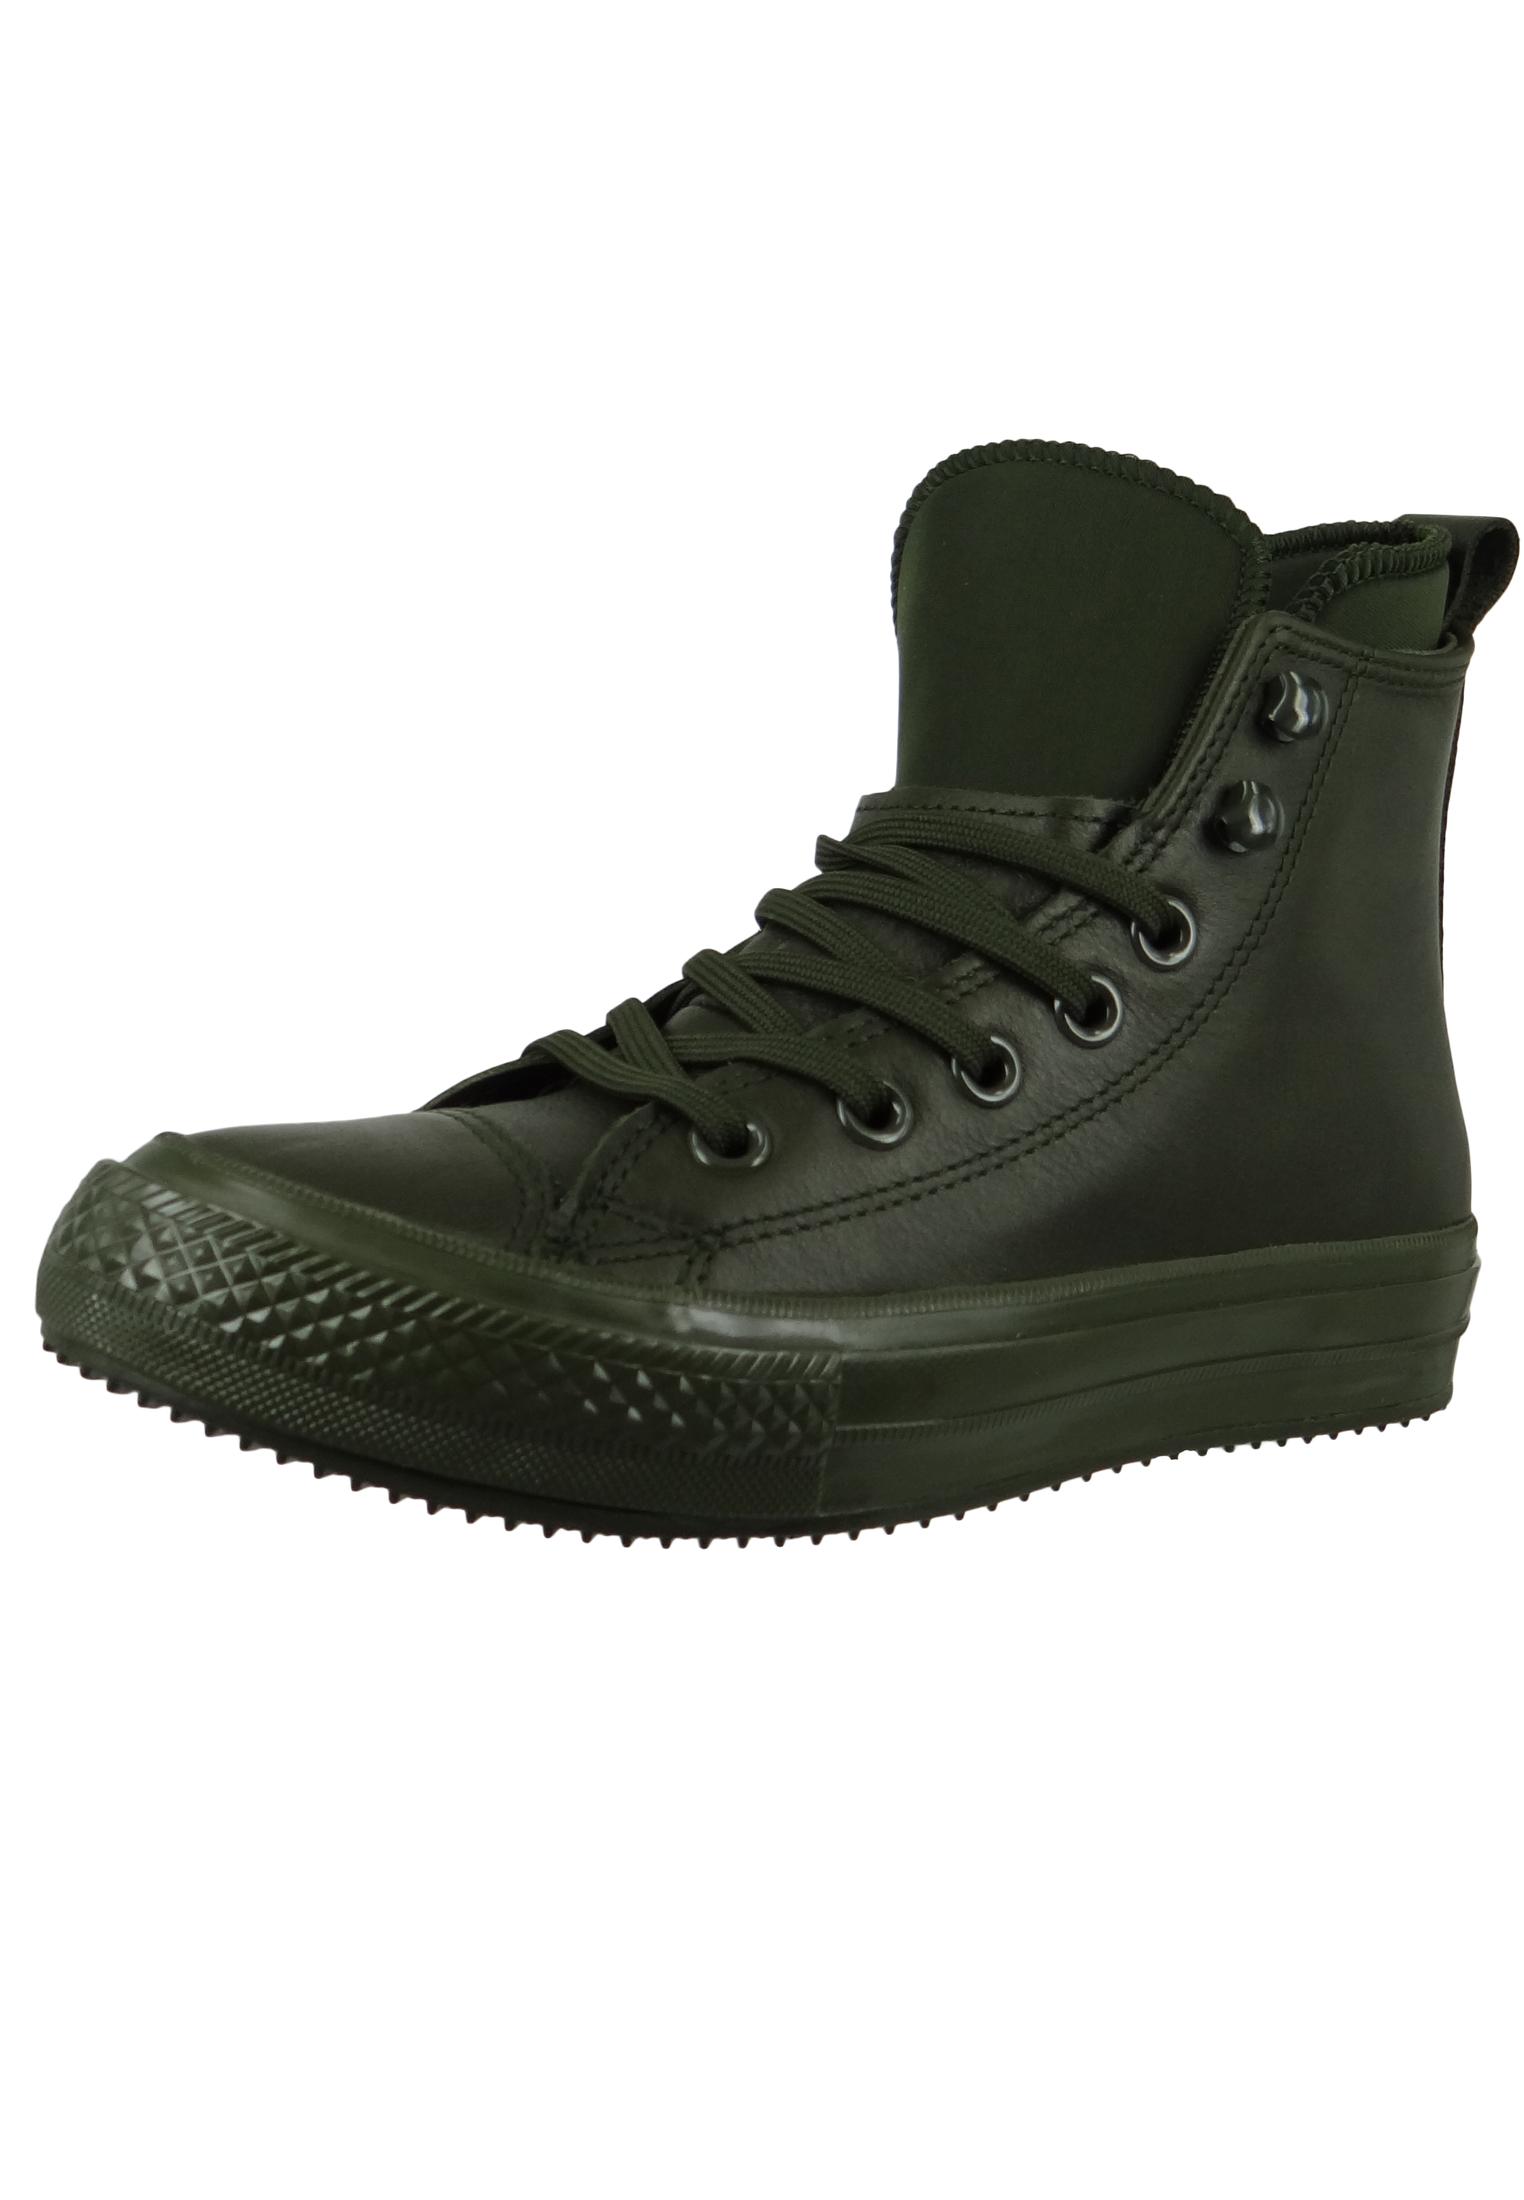 e1df253fb3ae ... spain converse chucks 162501c grün leder chuck taylor all star wp boot  utitlity green 78b8c 7769f